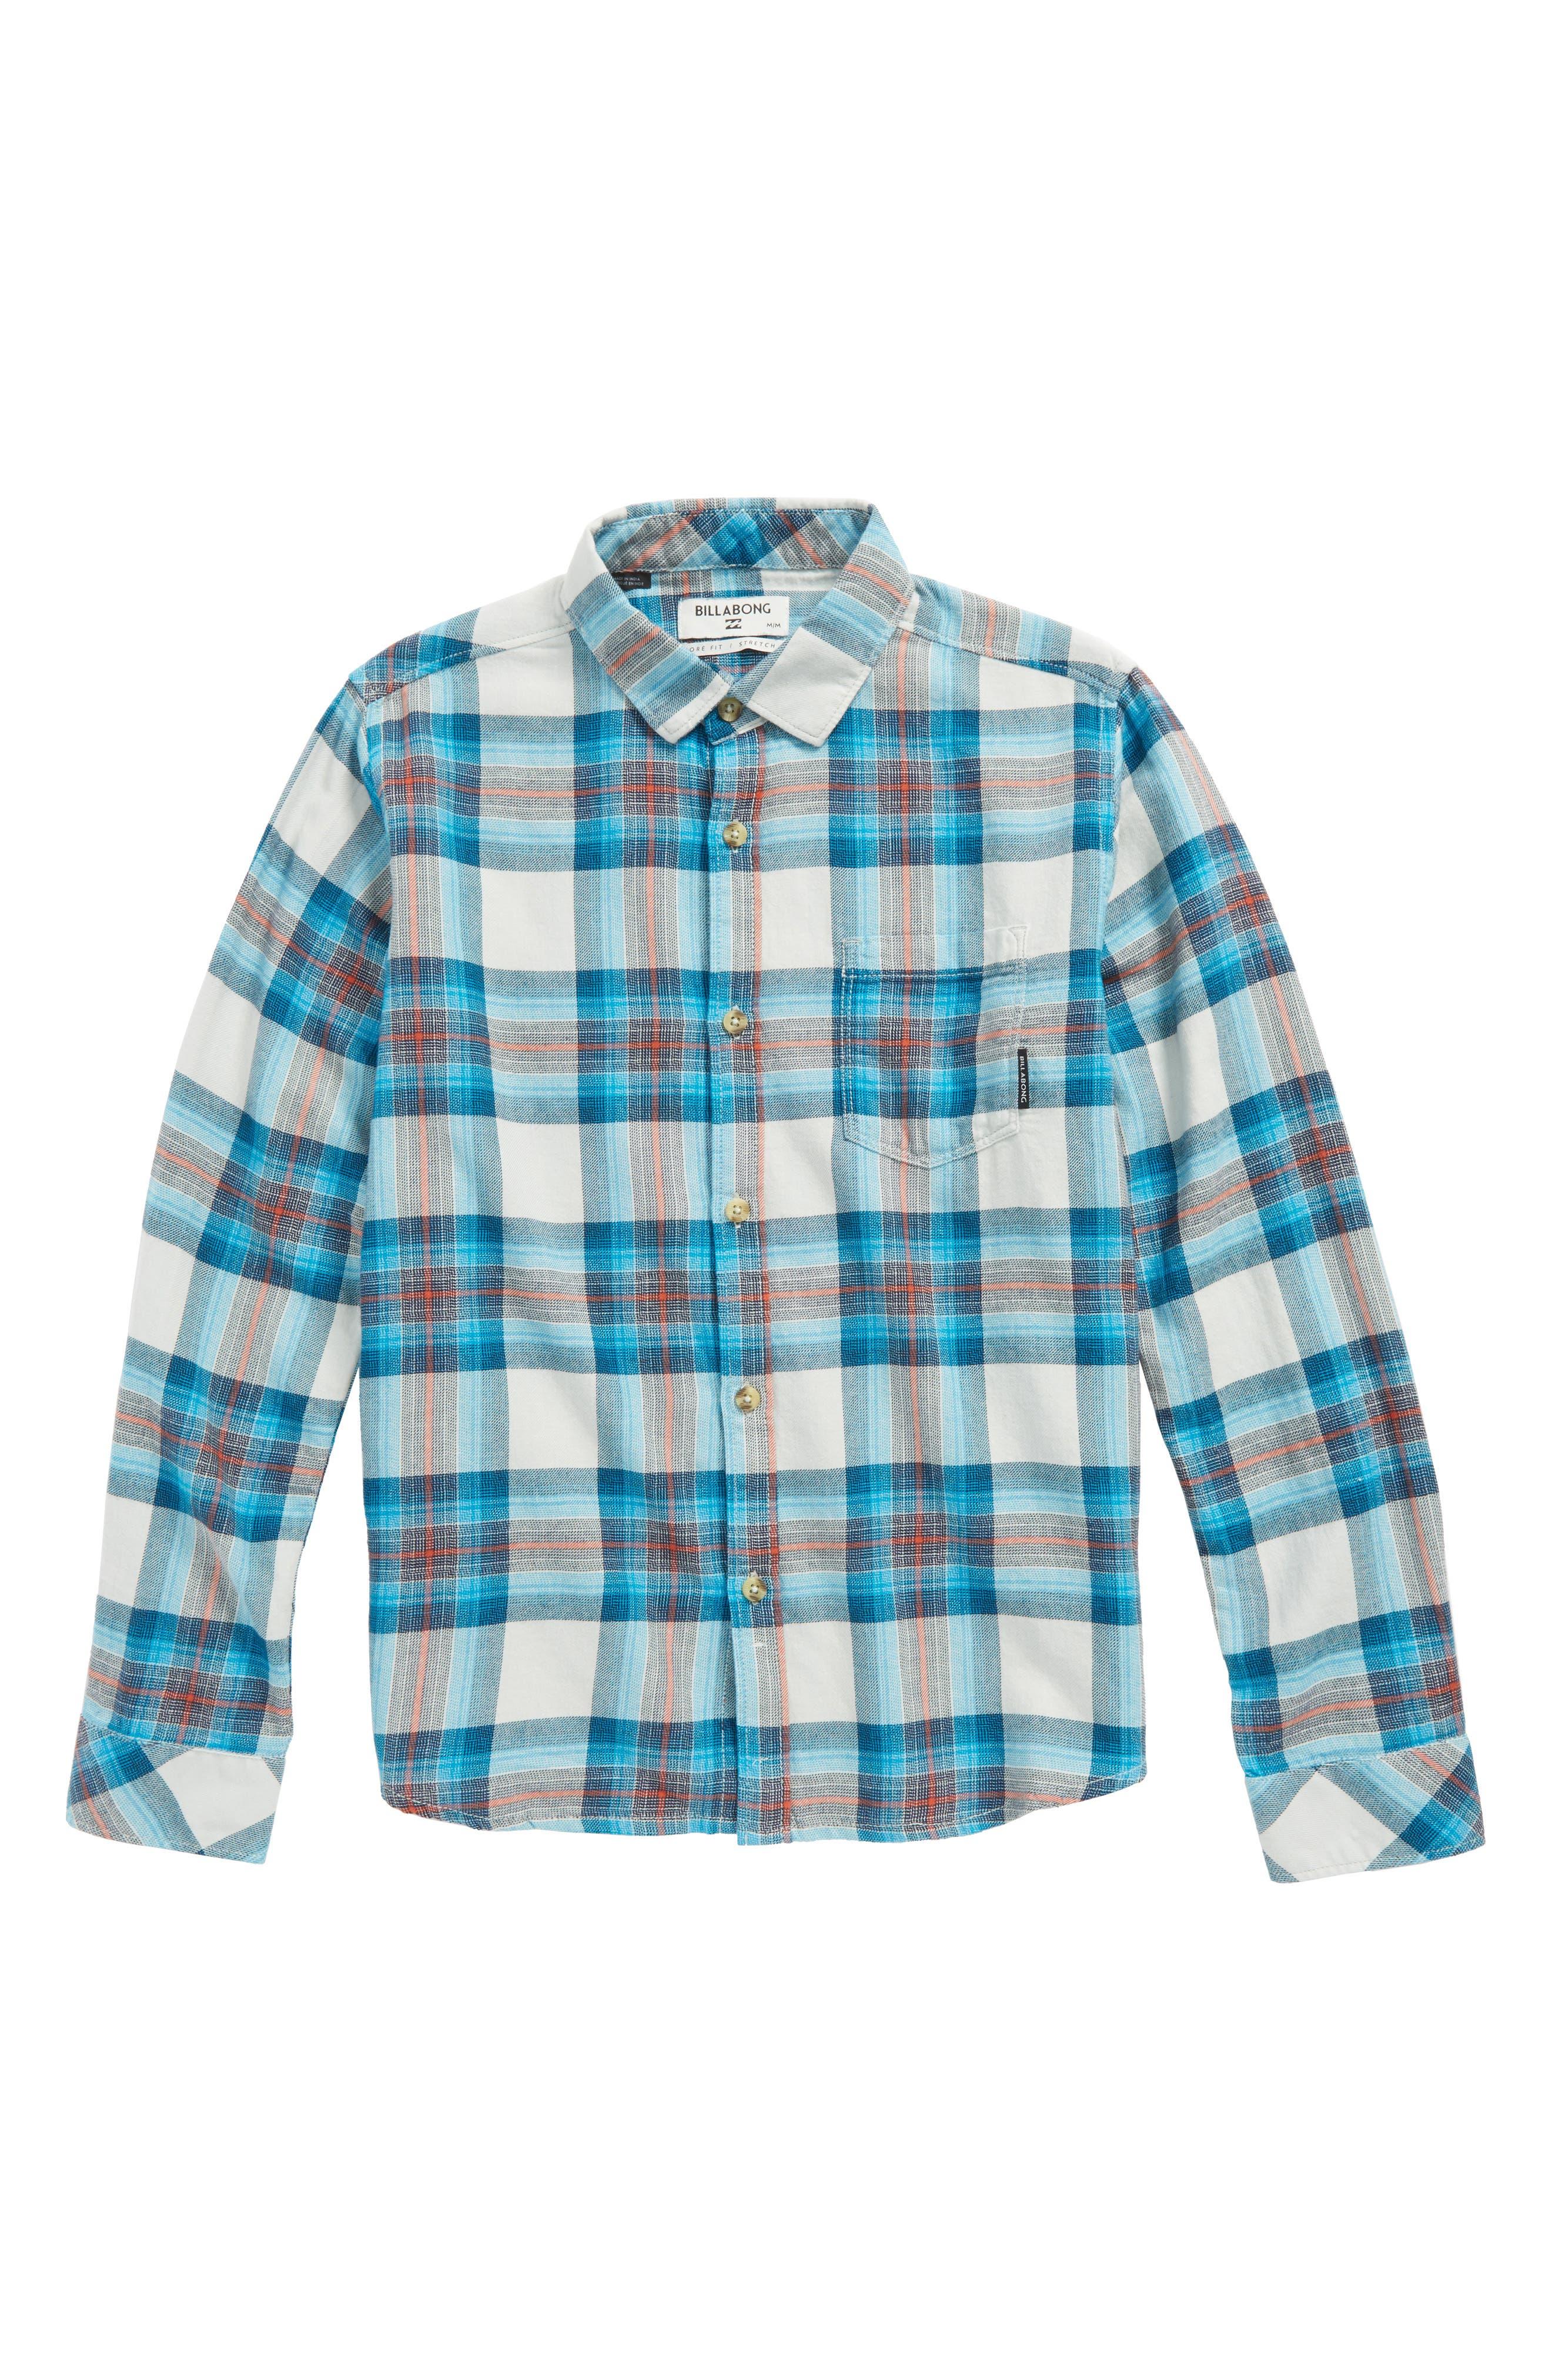 Freemont Plaid Flannel Shirt,                             Main thumbnail 1, color,                             020